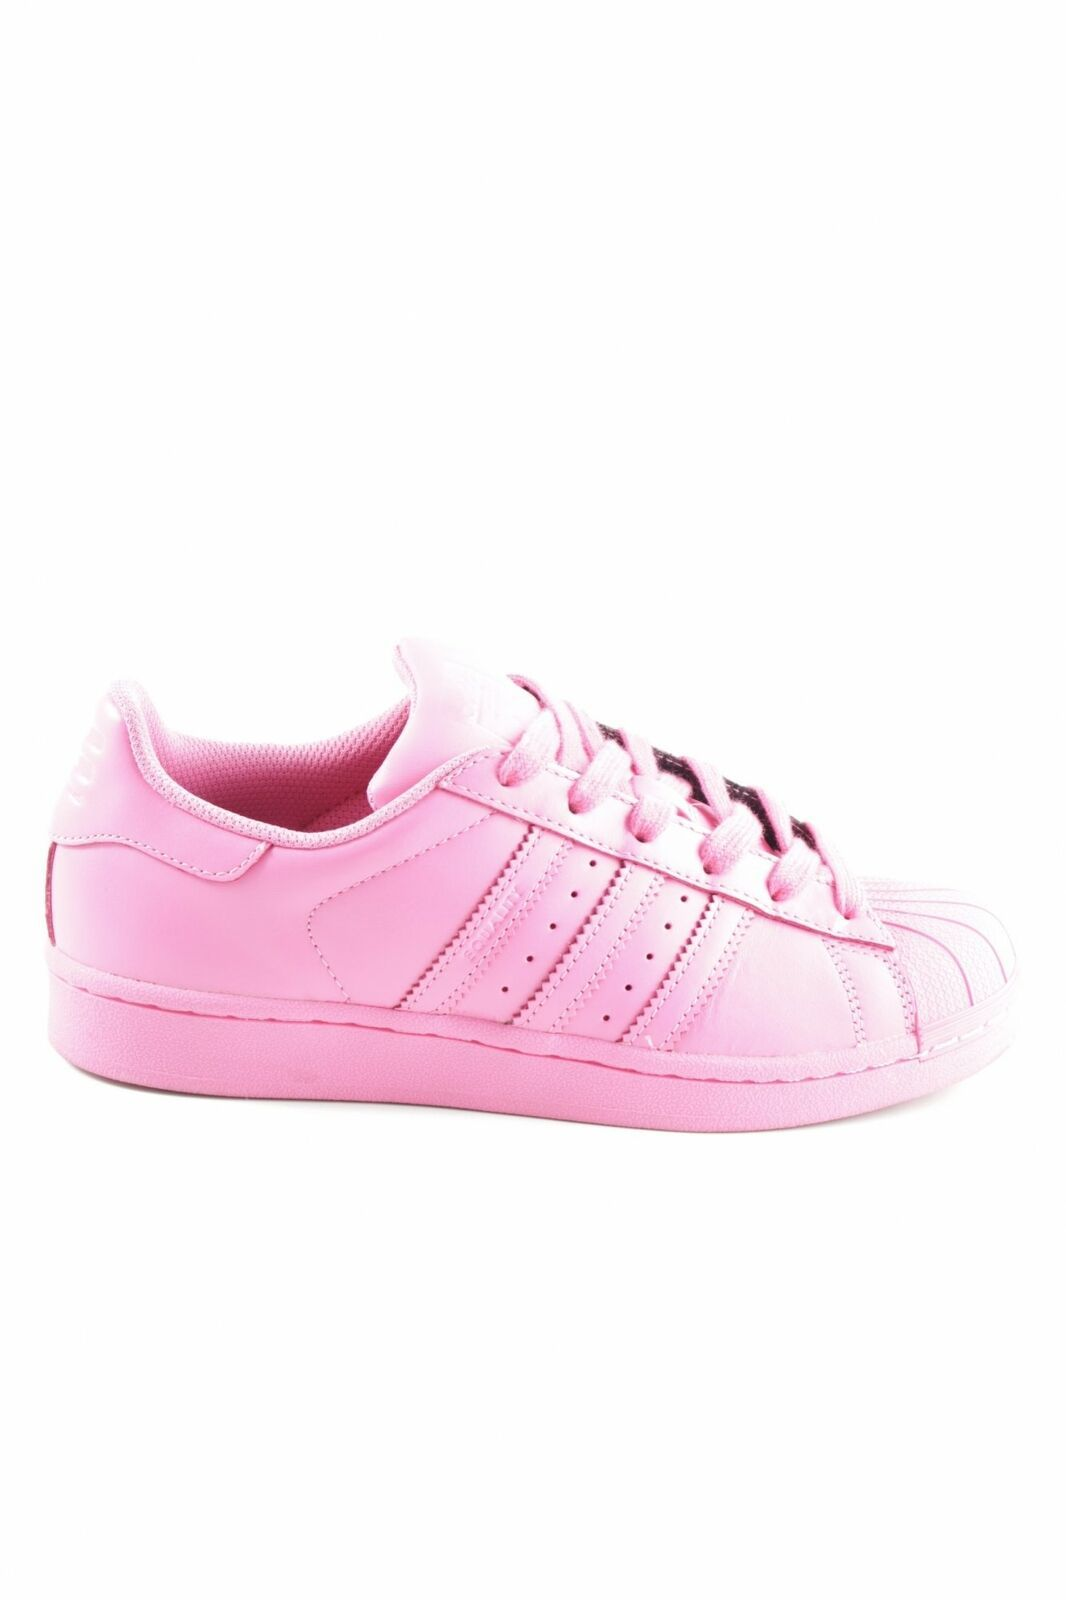 adidas donna stan smith rosa